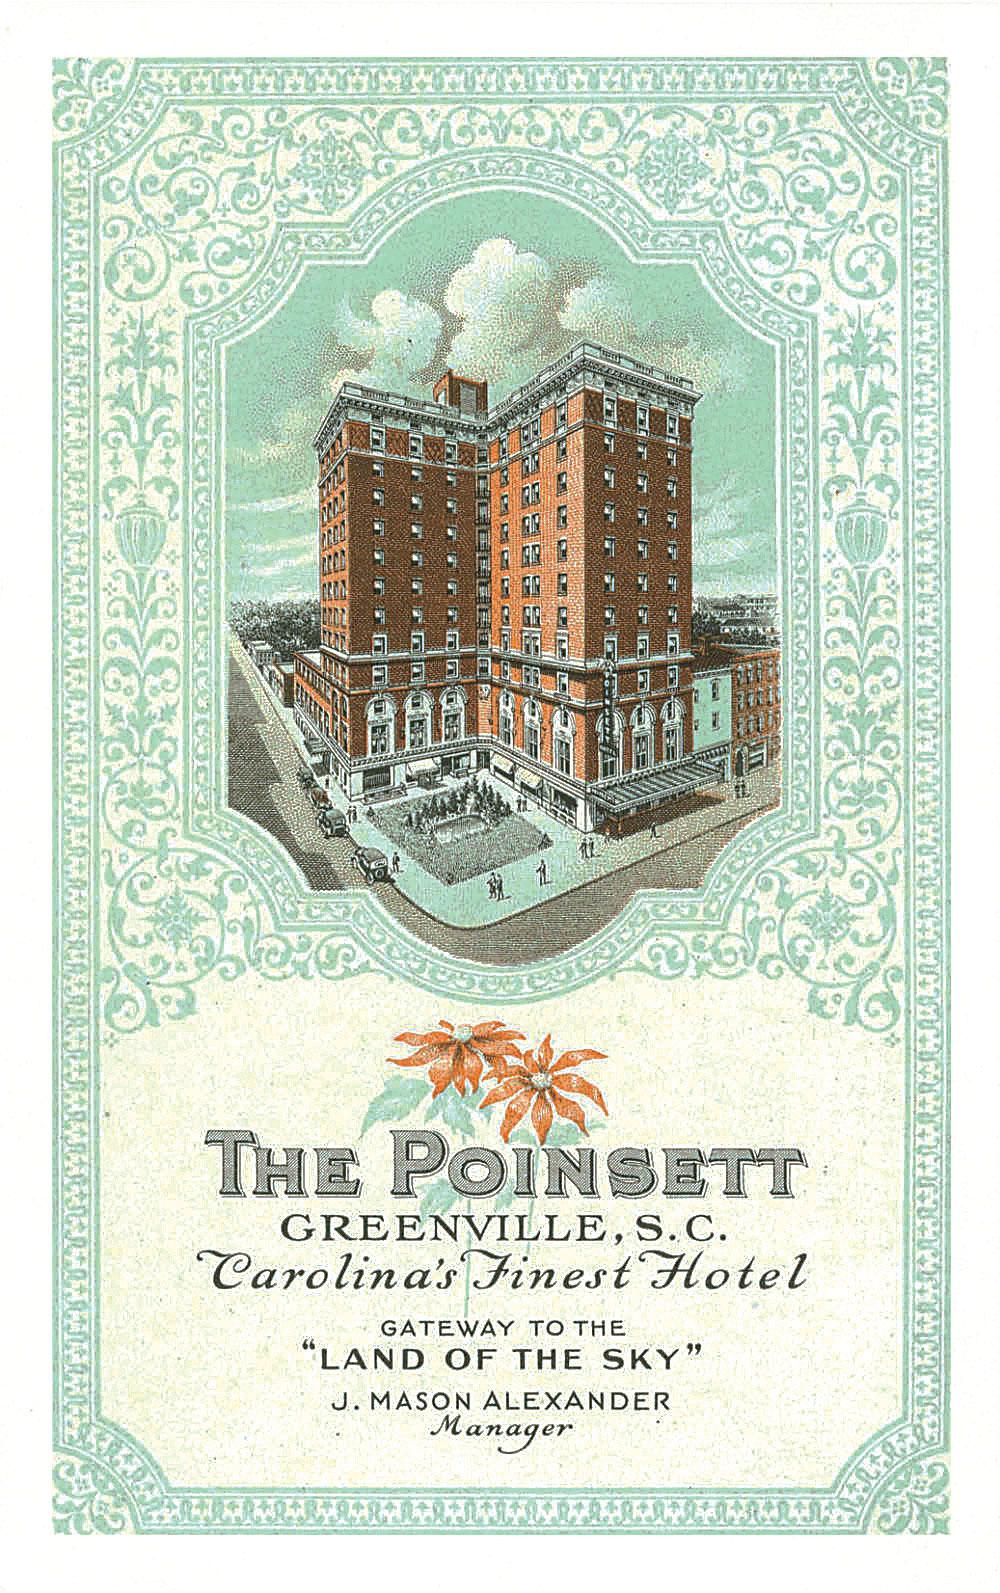 Poinsett Hotel Postcard (circa 1940's)